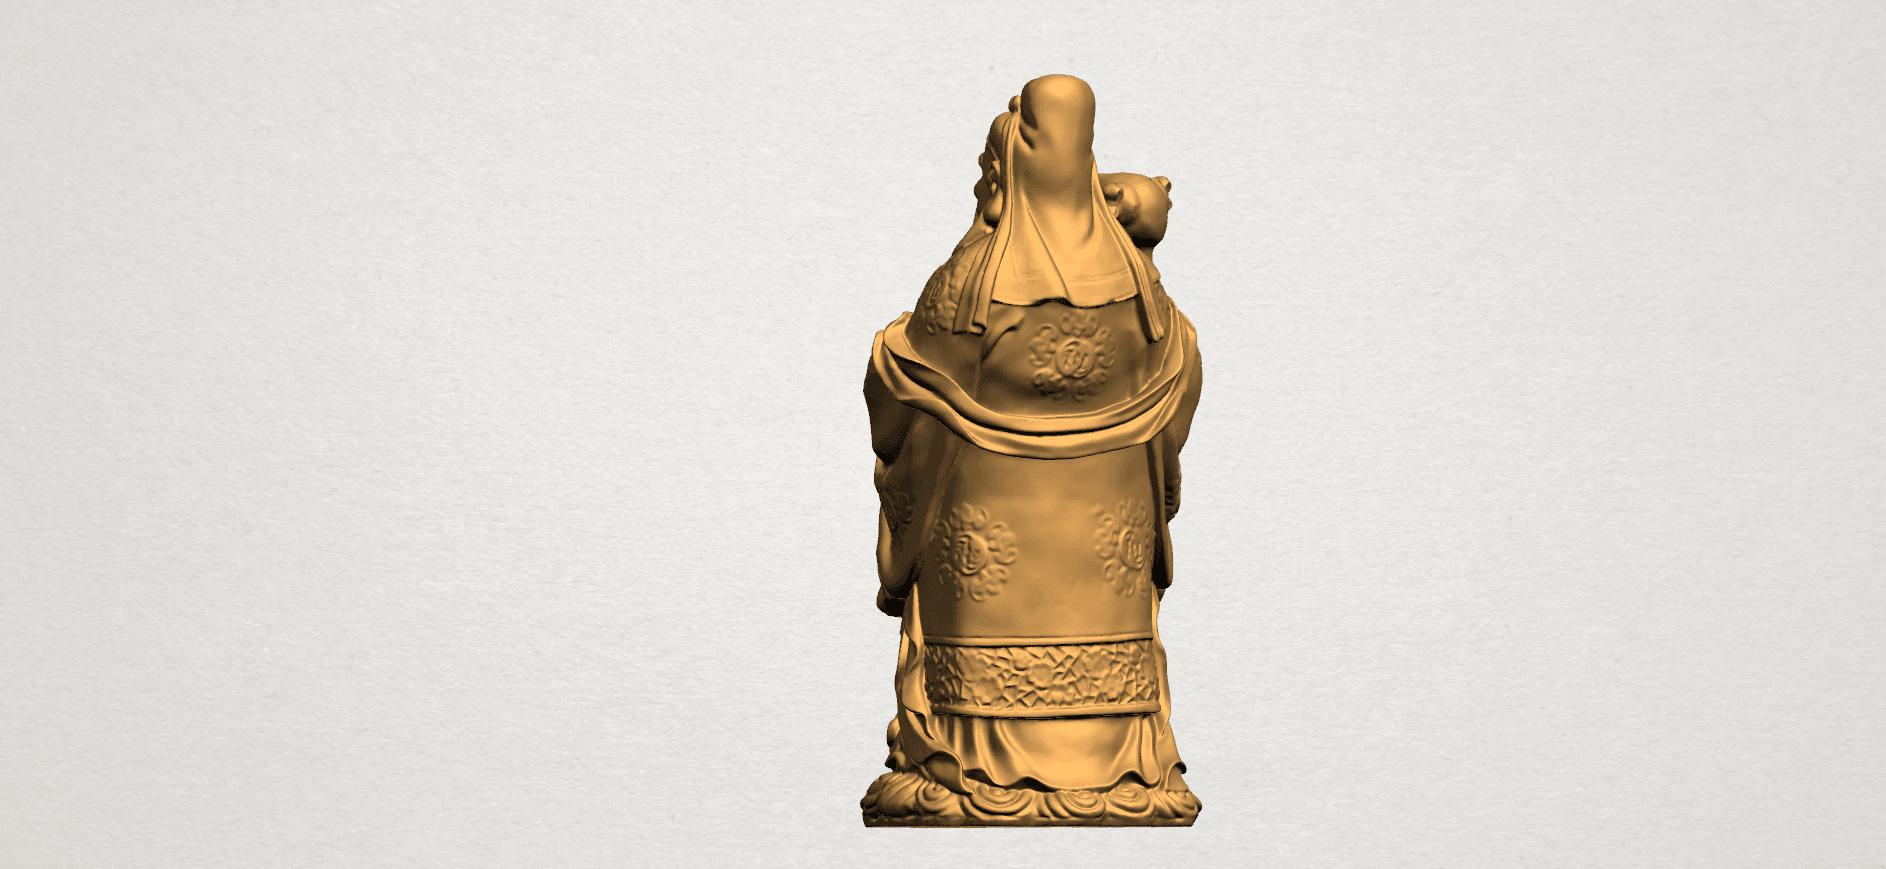 Fook (Fook Look Sao) 80mm - A04.png Télécharger fichier STL gratuit Fook (Fook Look Sao) • Design à imprimer en 3D, GeorgesNikkei